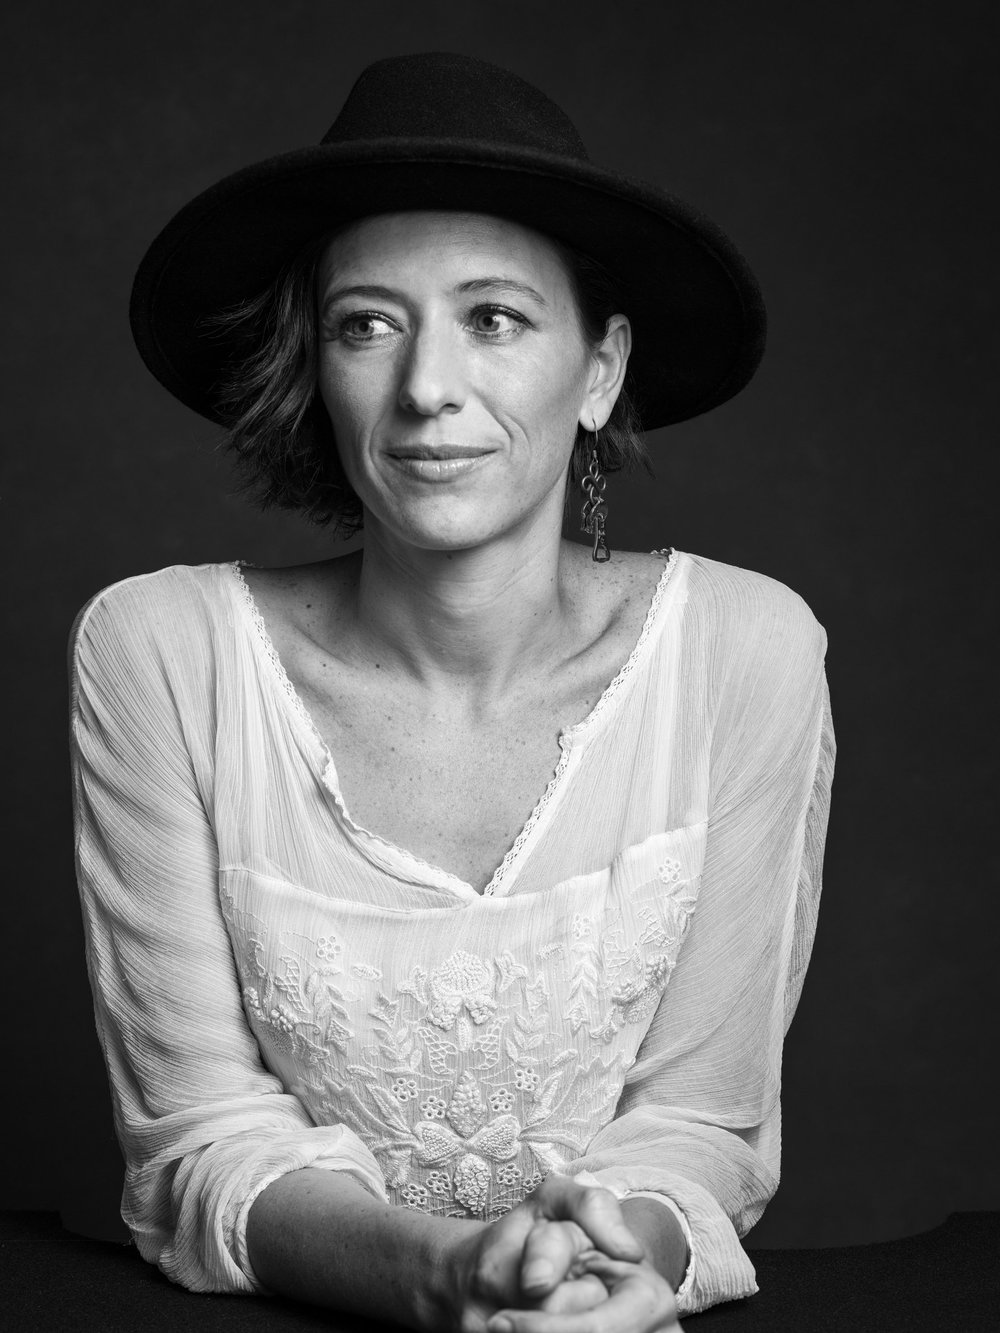 Jeanne Samayoa - Architect / Passionate about Urbanism